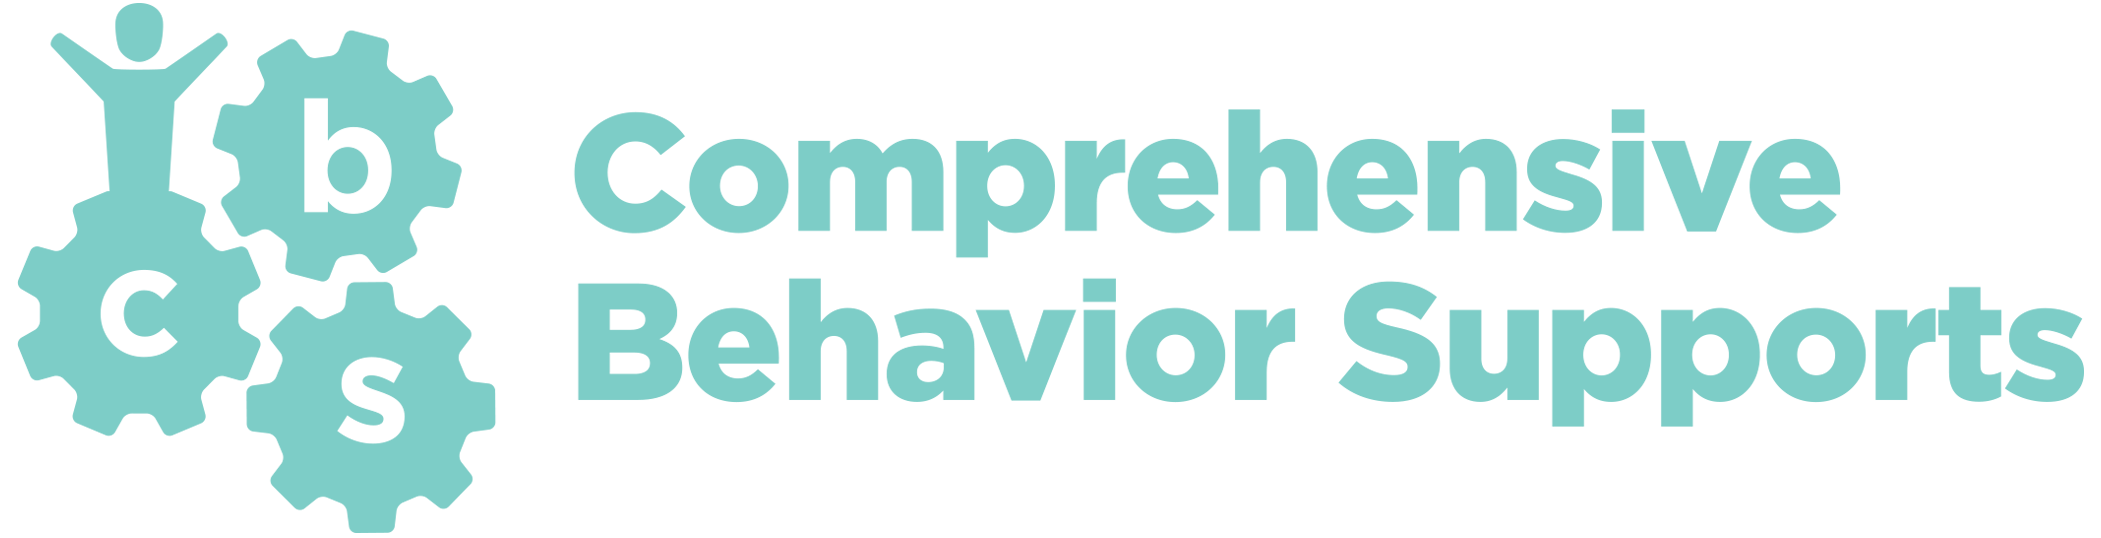 BCBA - Comprehensive Behavior Supports - Job Board